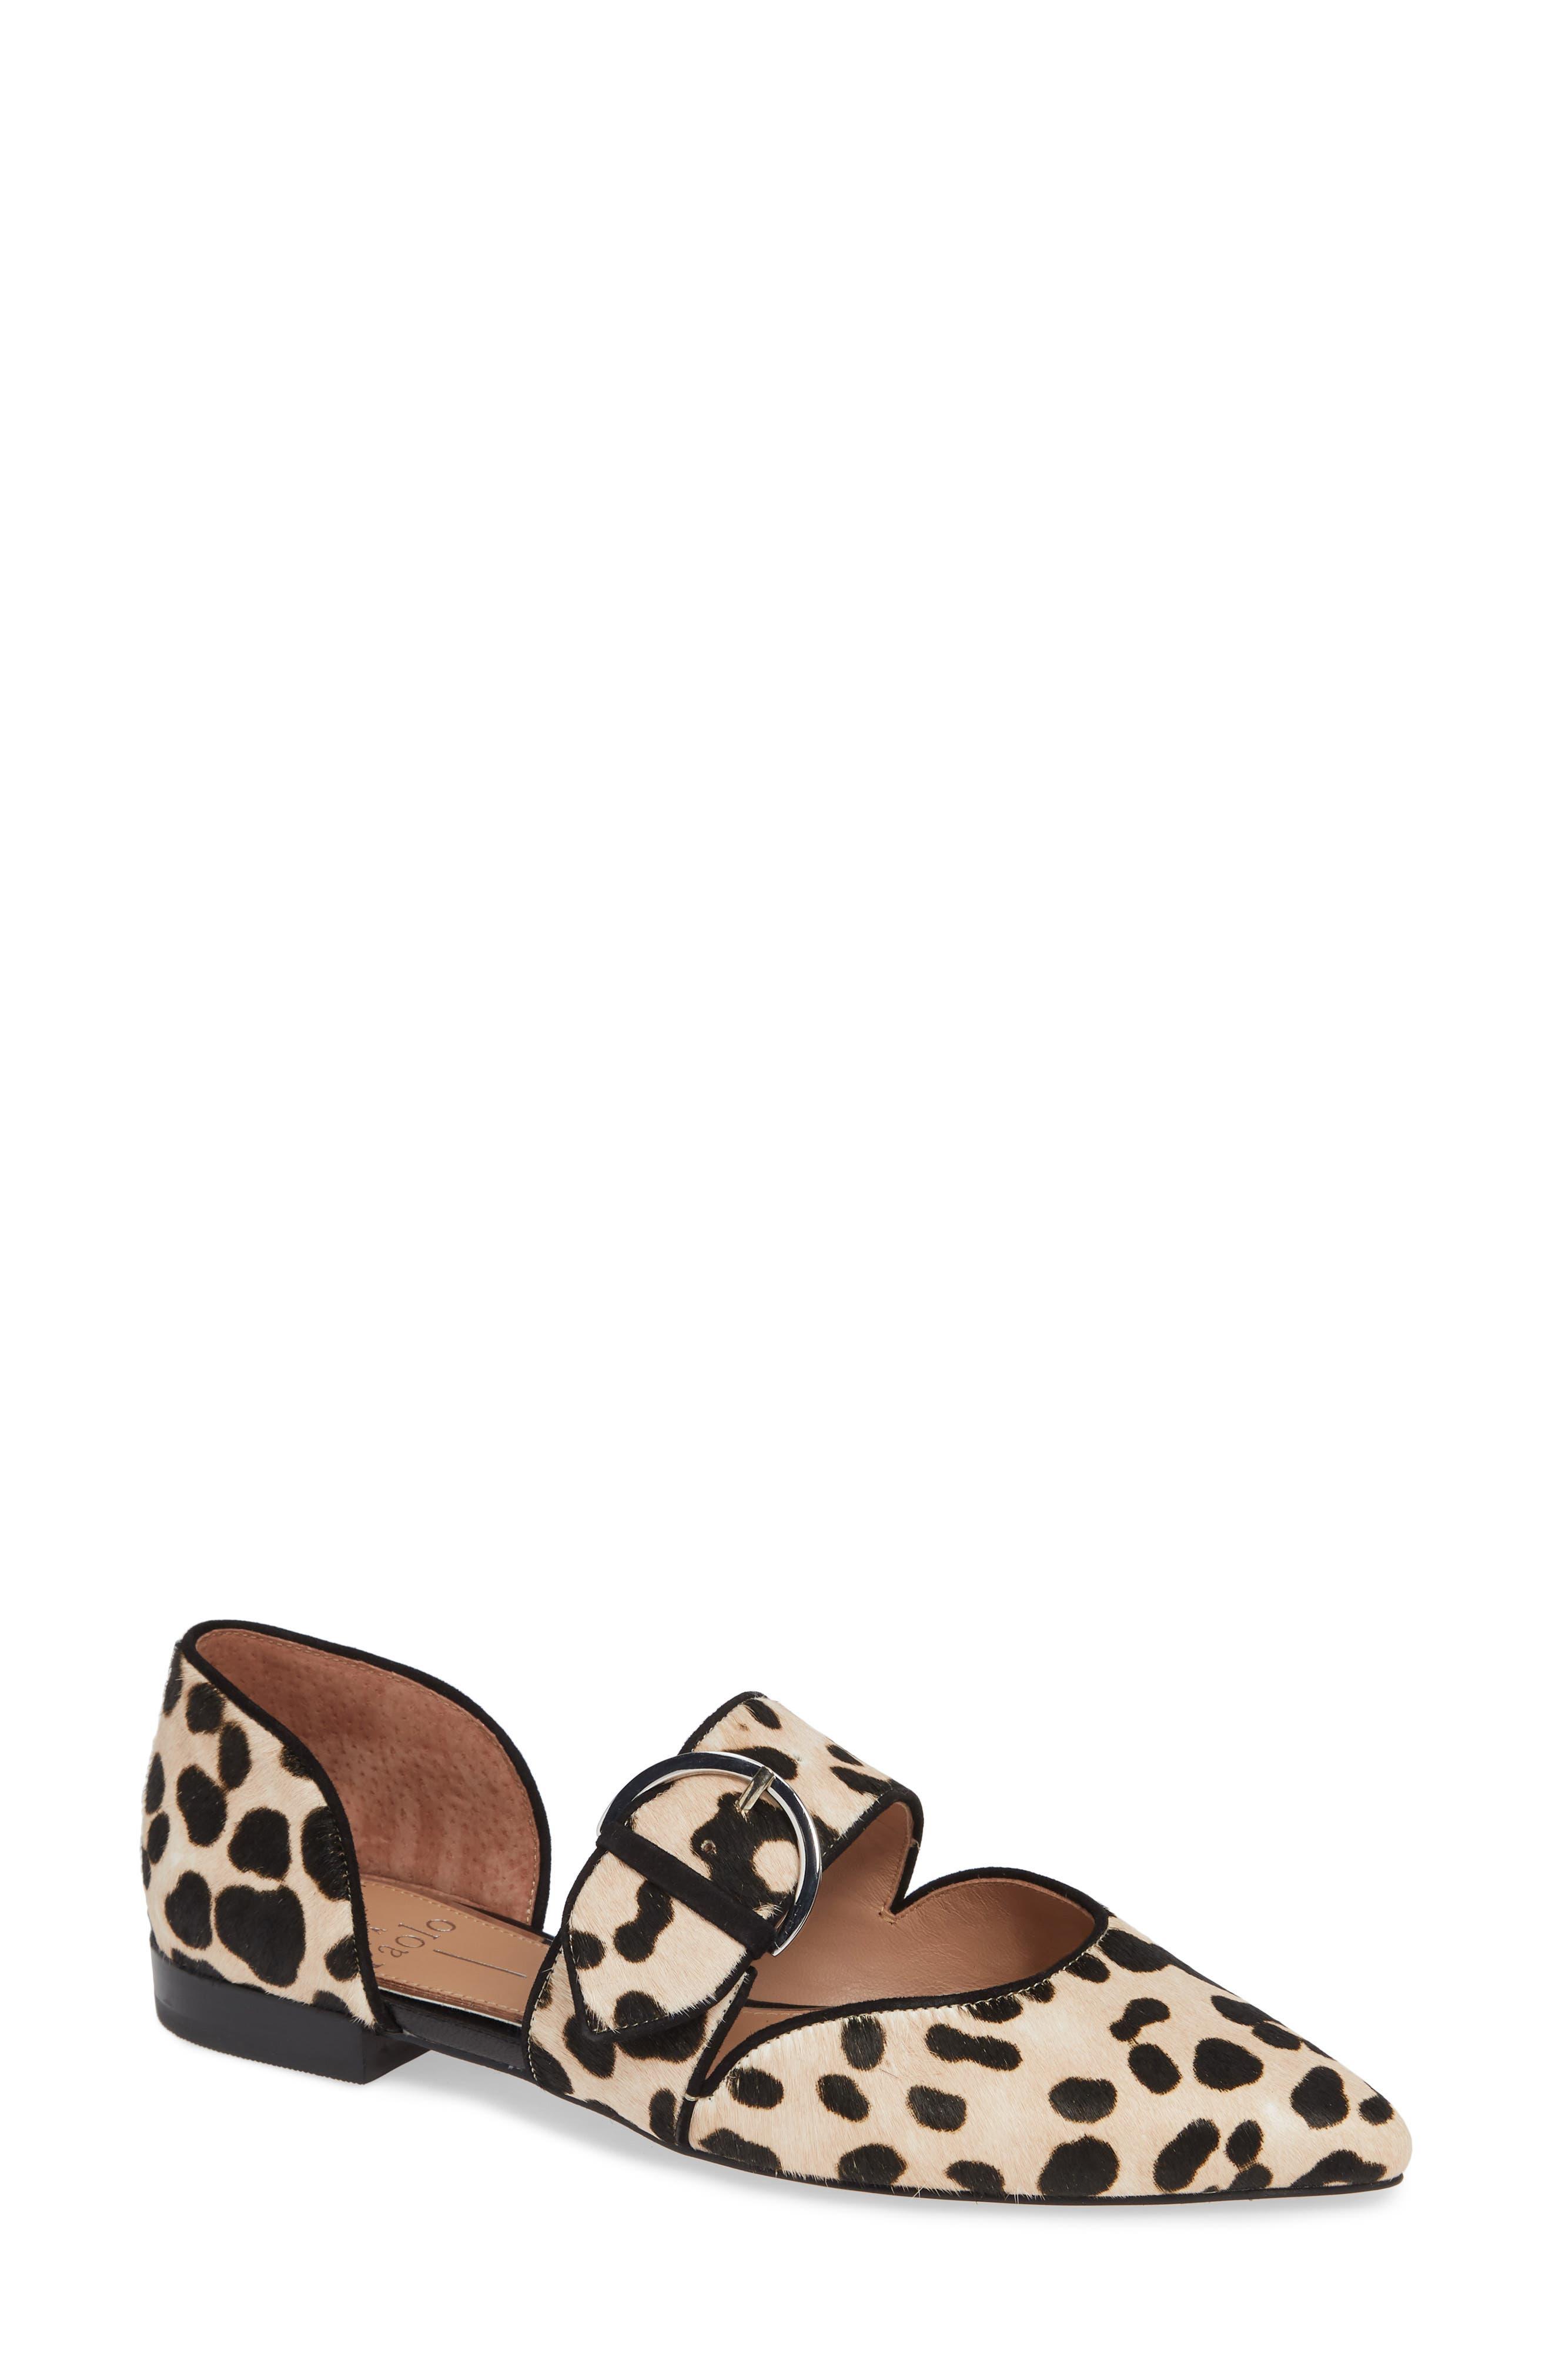 LINEA PAOLO Dean Pointy Toe Flat, Main, color, WHITE/ BLACK PRINT HAIRCALF